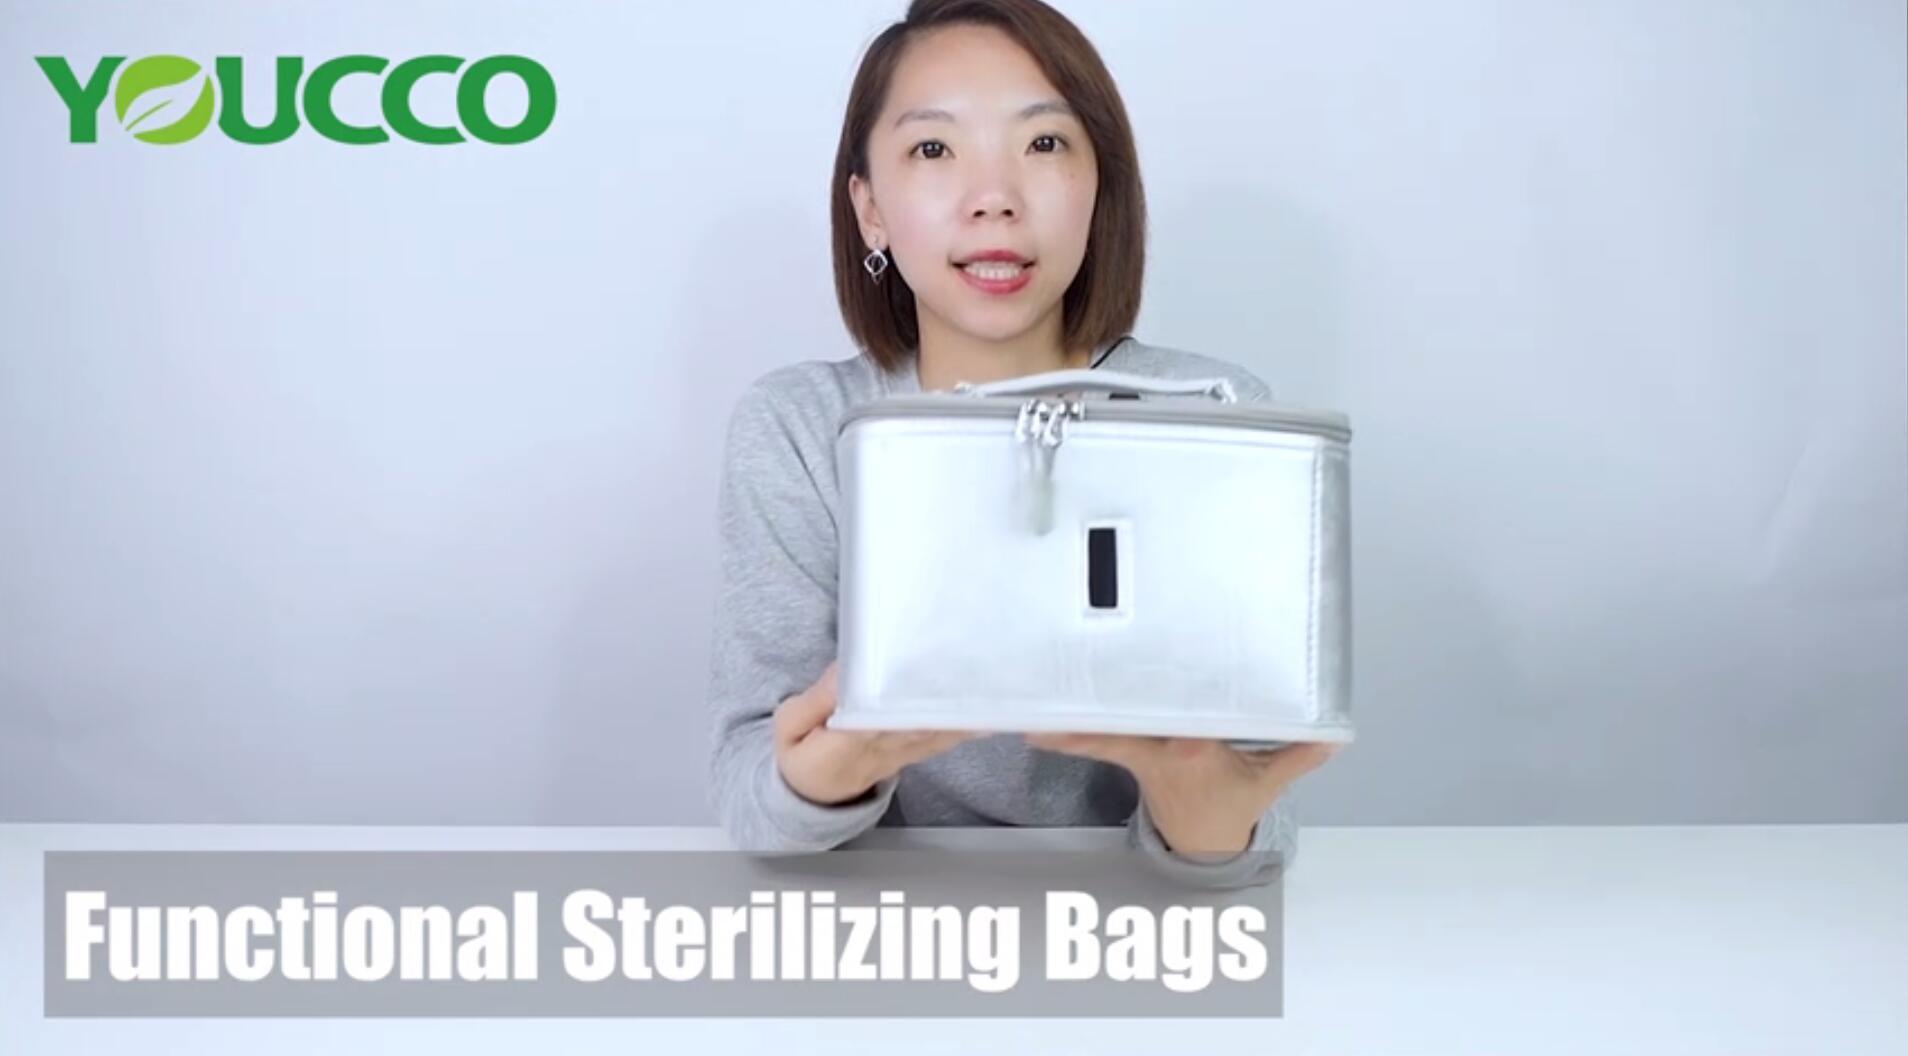 USB UVC LED Portable Disinfection Sterilizer Bag 210302